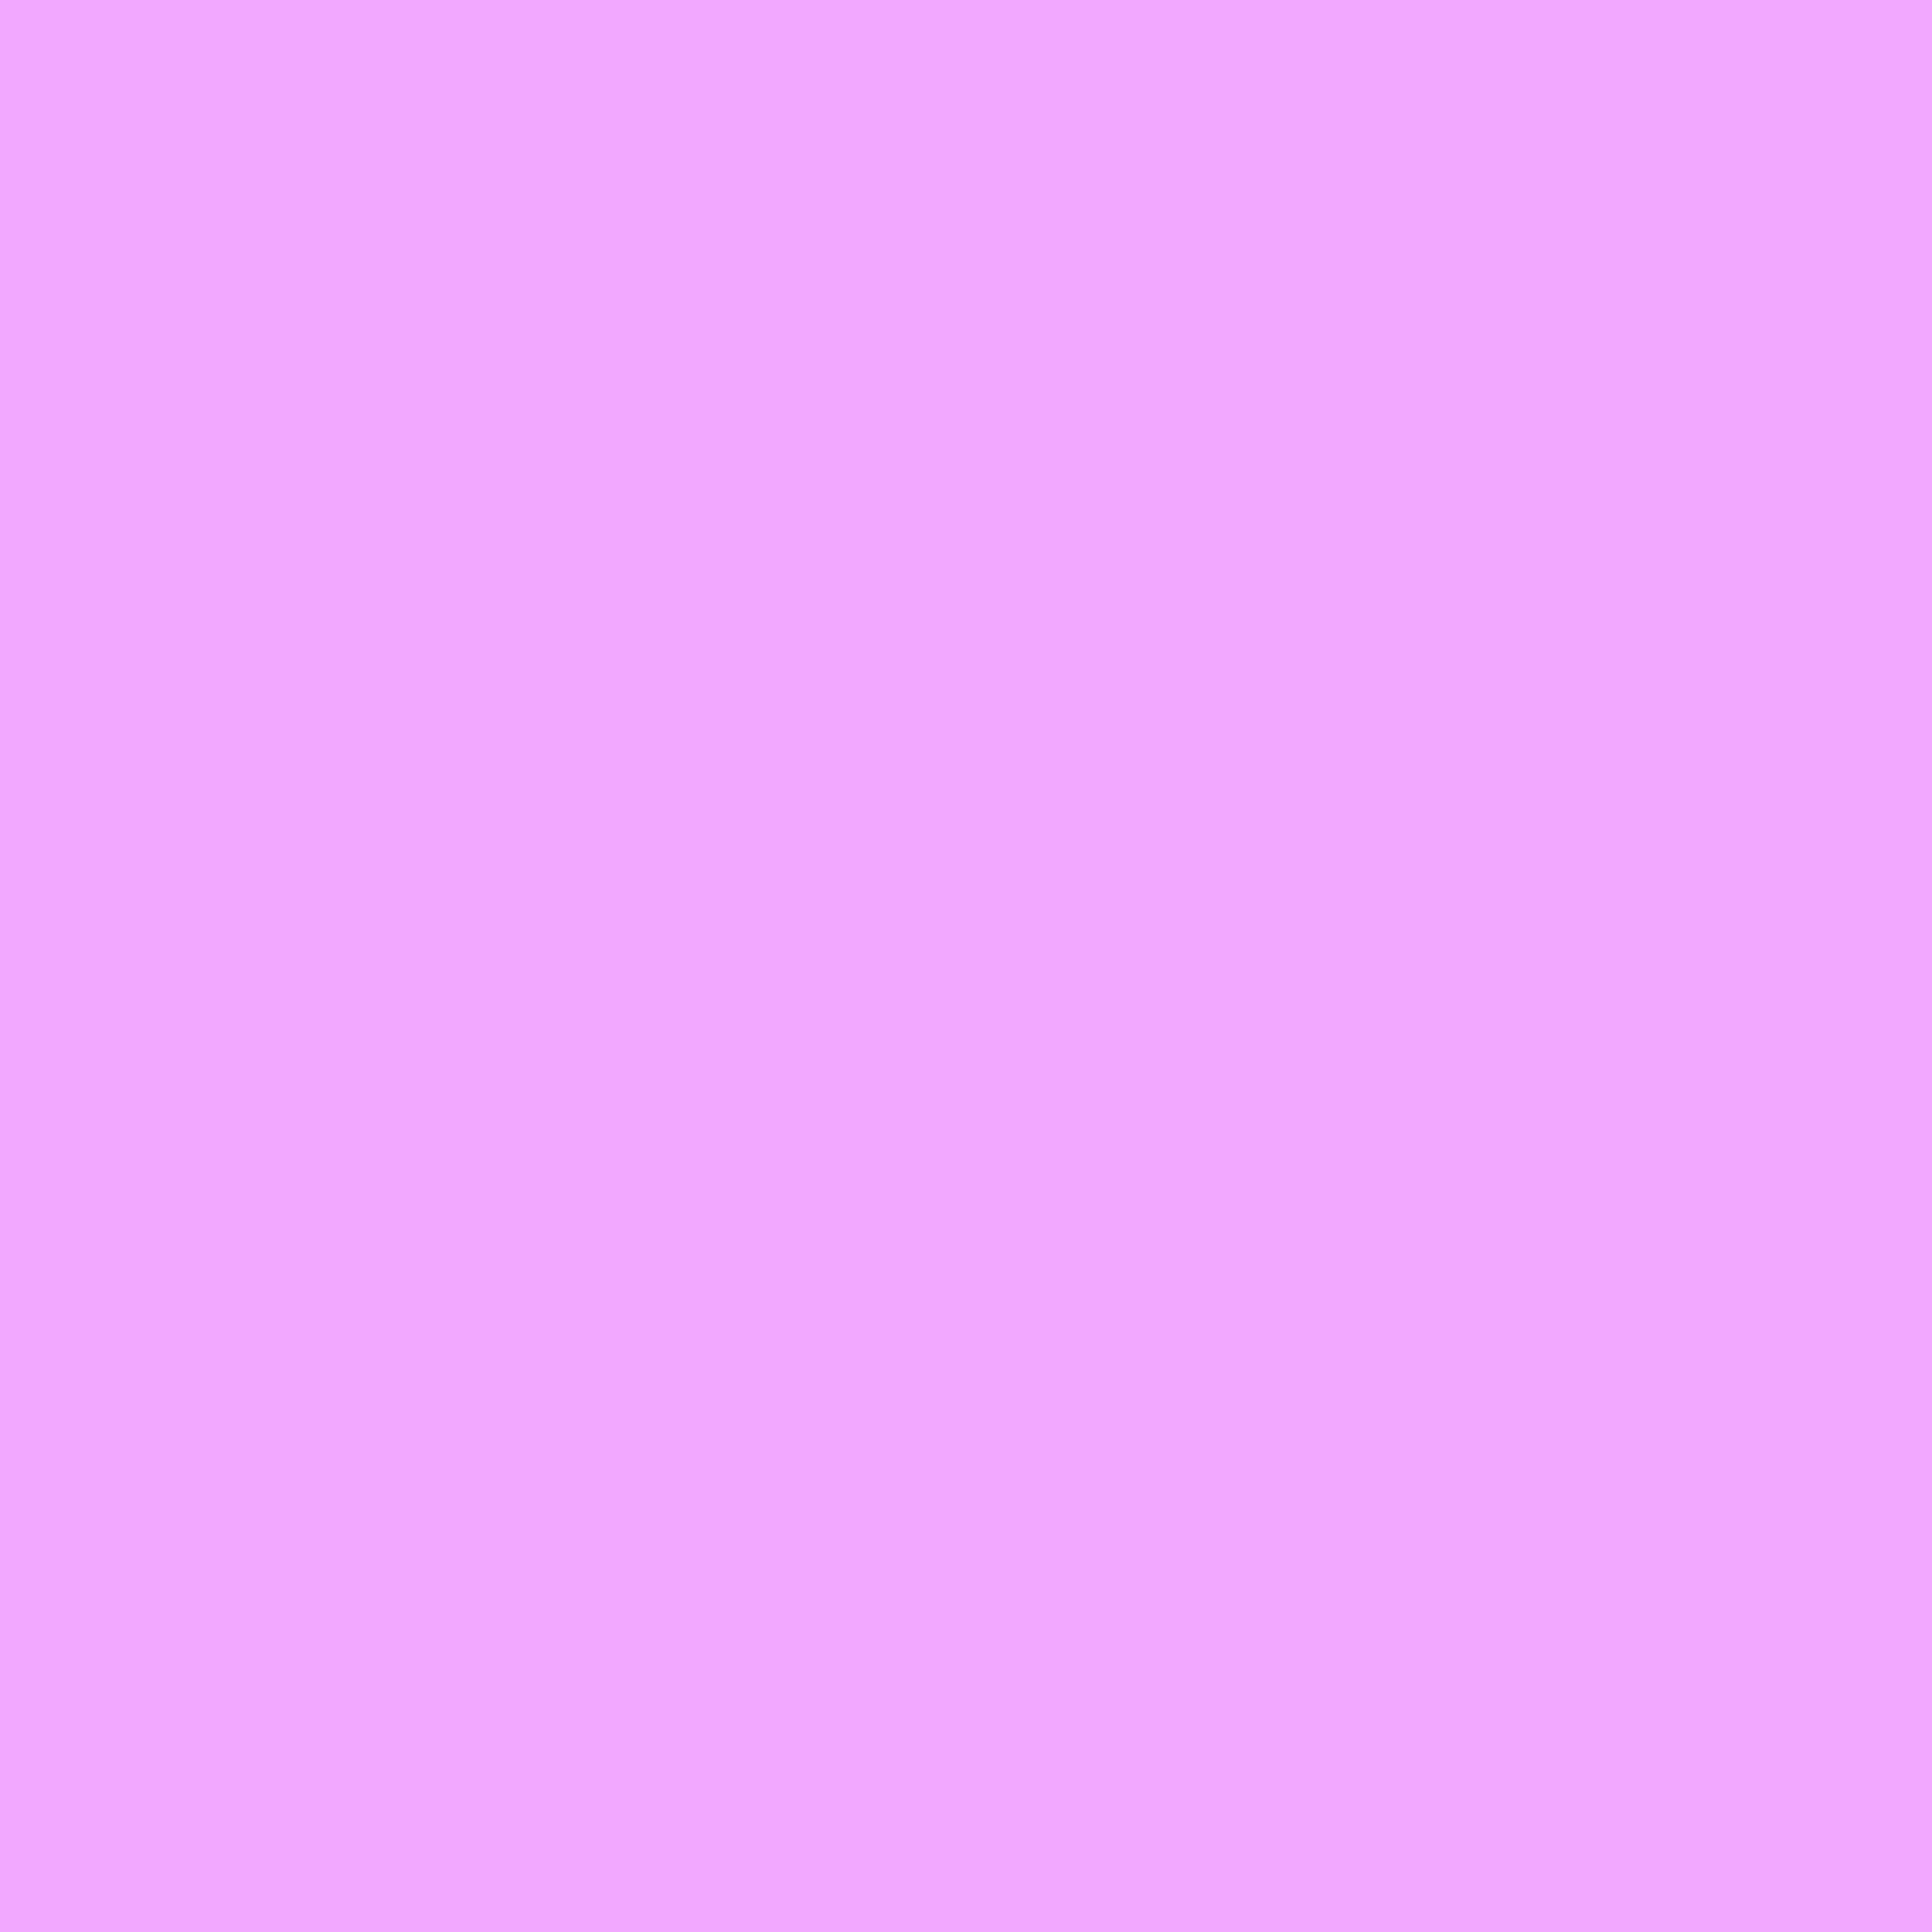 3600x3600 Rich Brilliant Lavender Solid Color Background